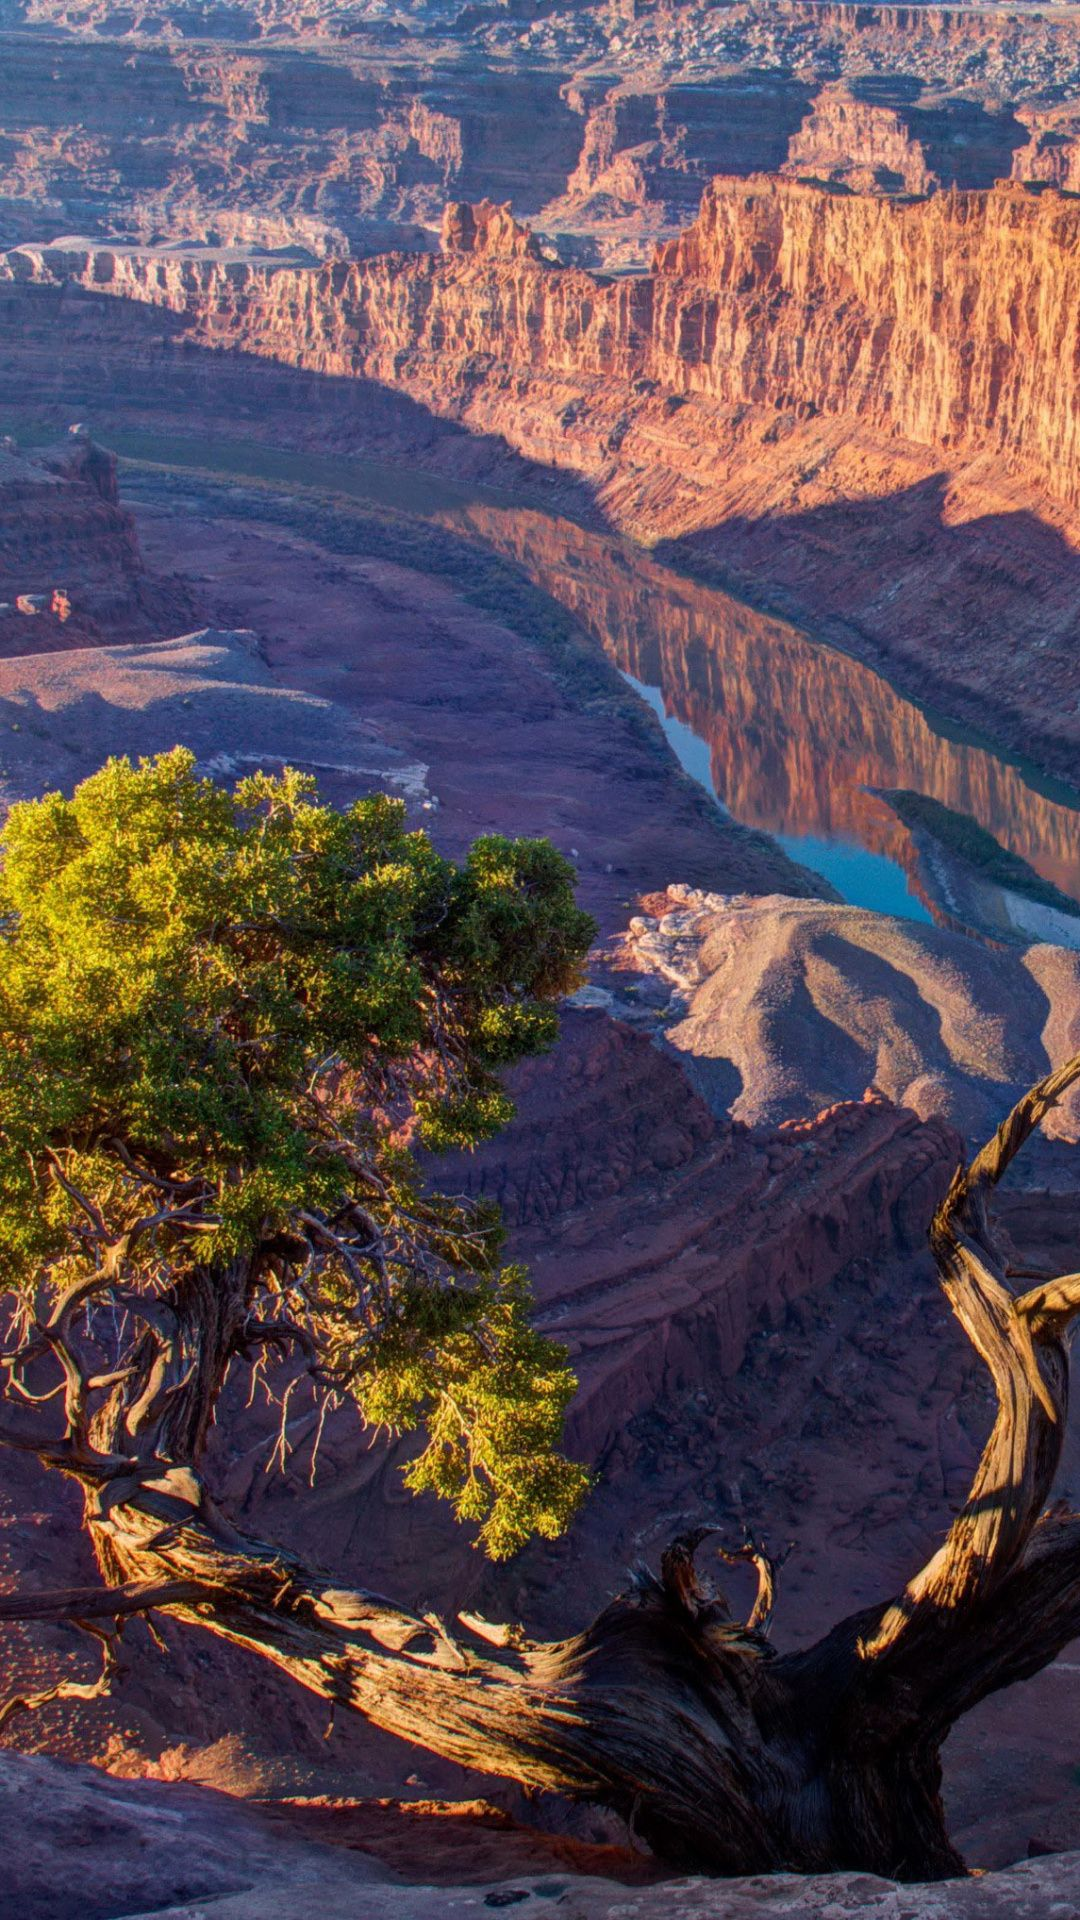 Zion National Park Formation Wilderness Desert Escarpment Geology